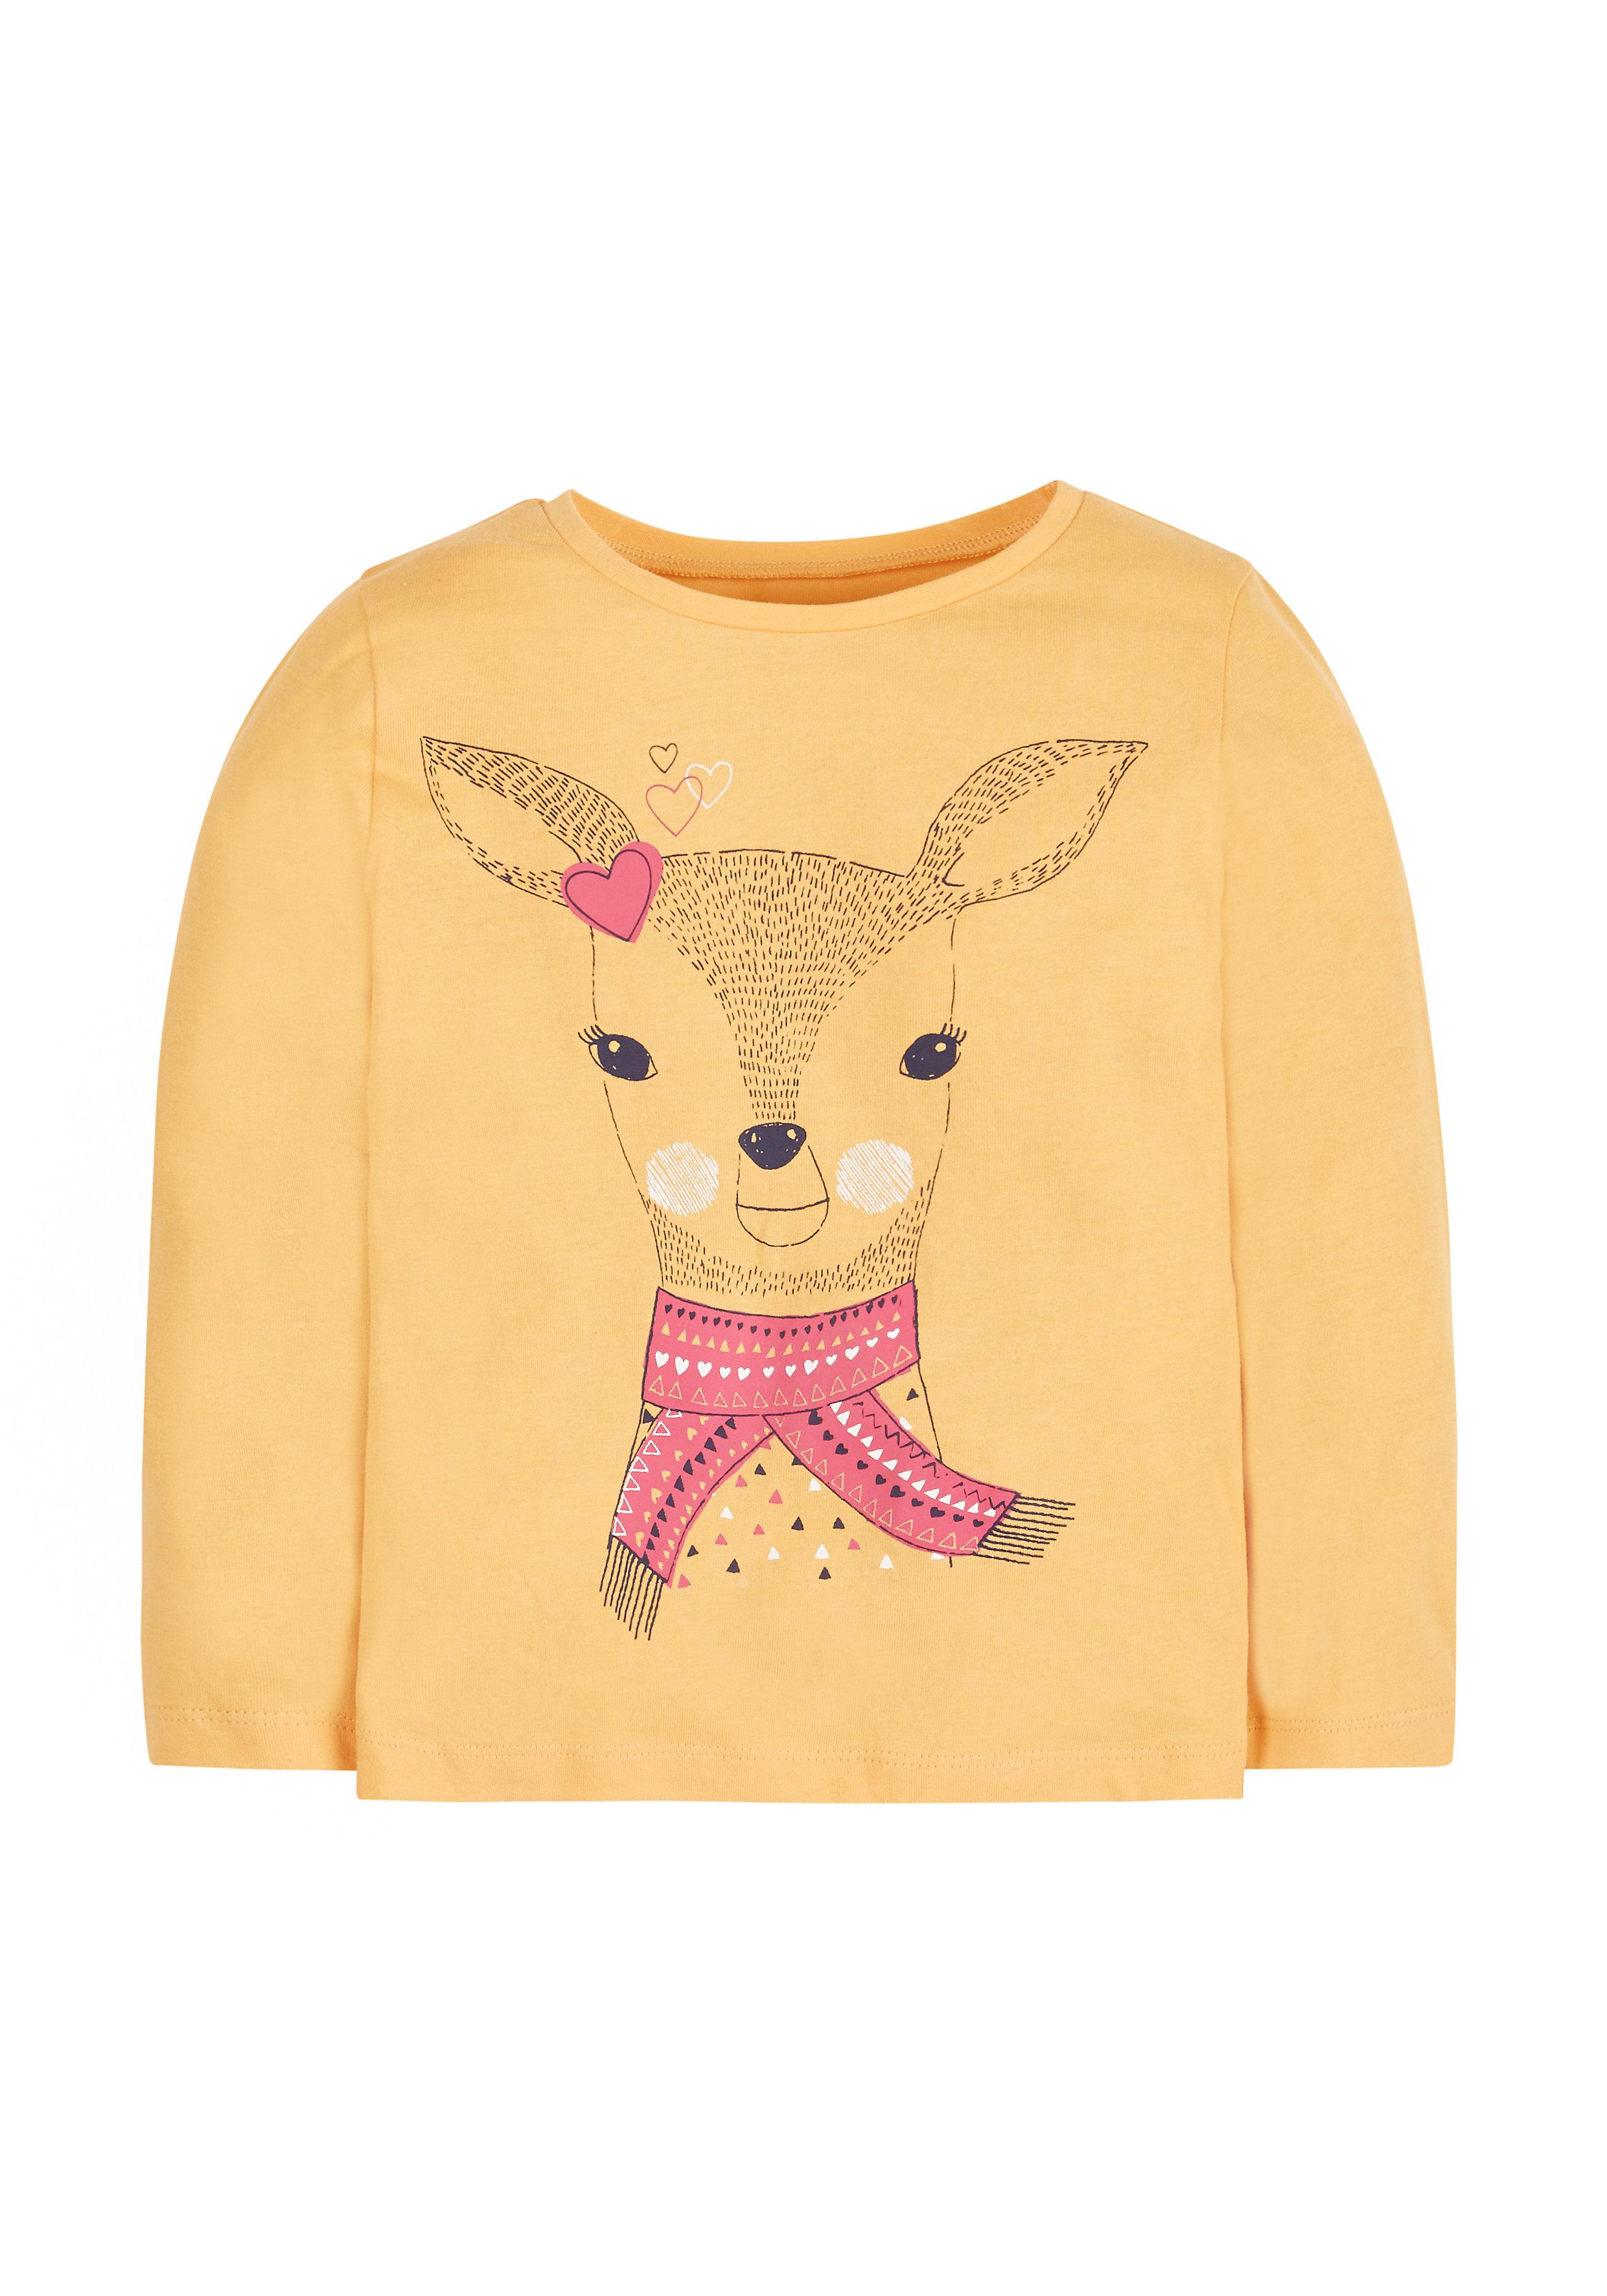 Mothercare   Girls Full Sleeves T-Shirt  Deer Print - Yellow